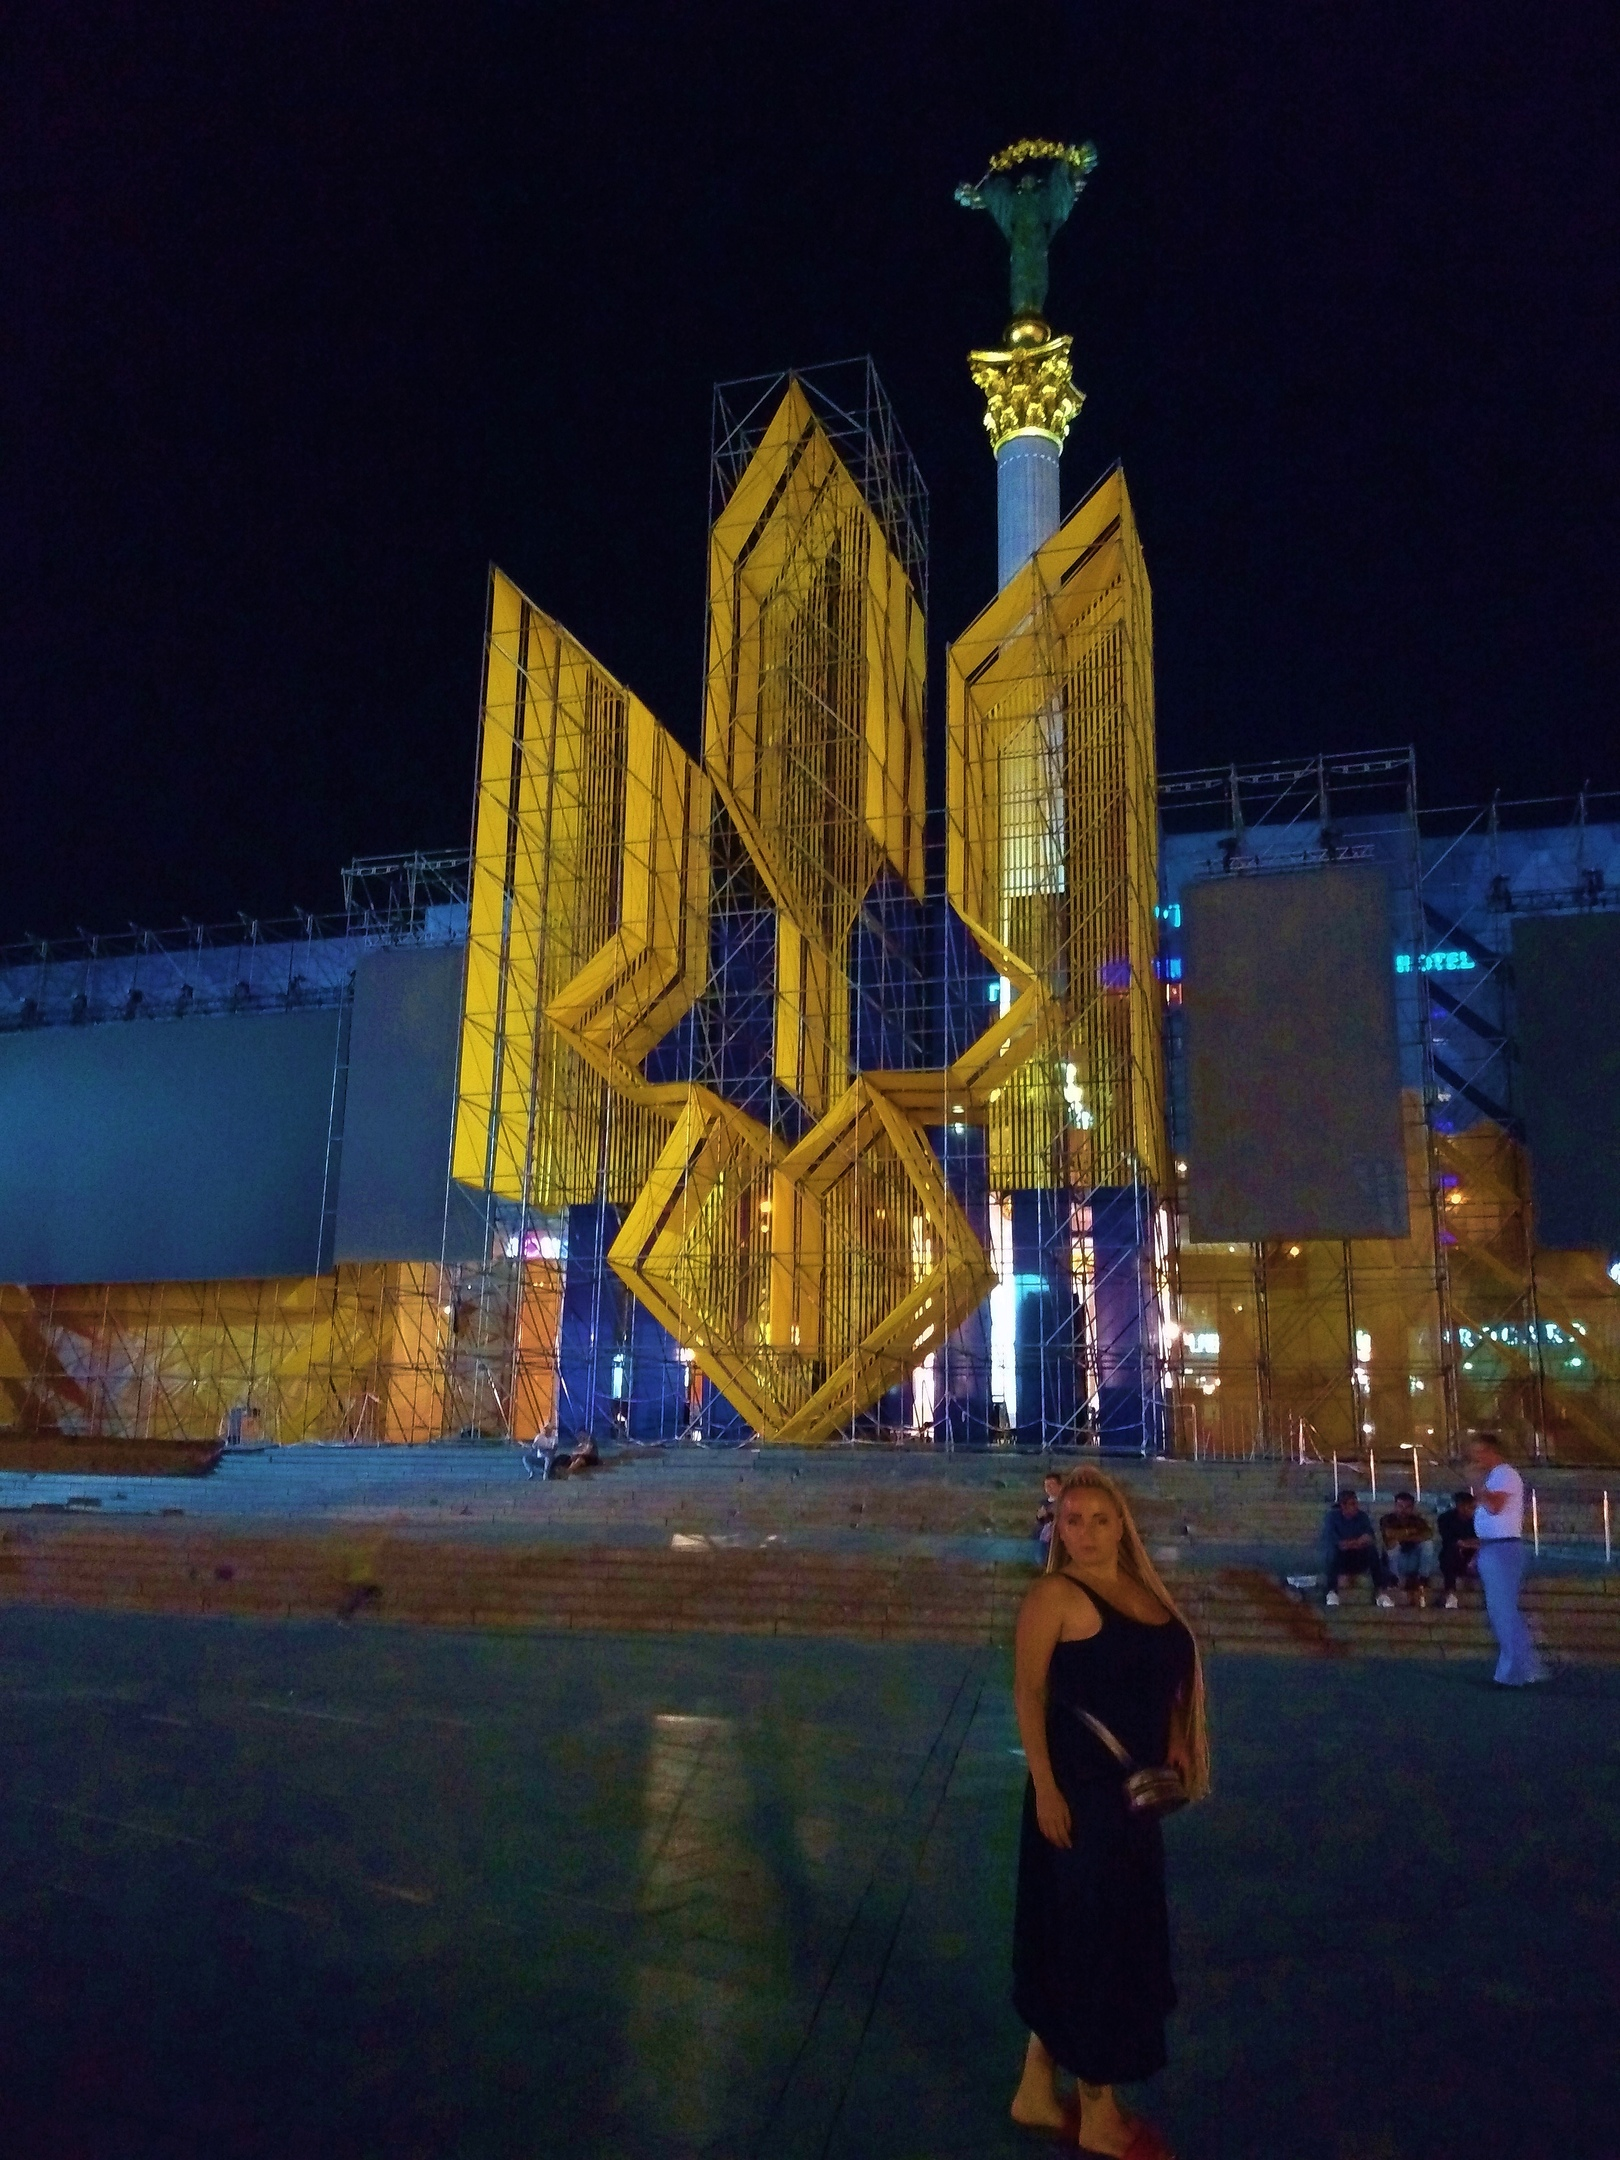 Елена Руденко (Валтея). Украина. Киев. Фото и описание.  - Страница 2 ZtFFF1Cy-K0